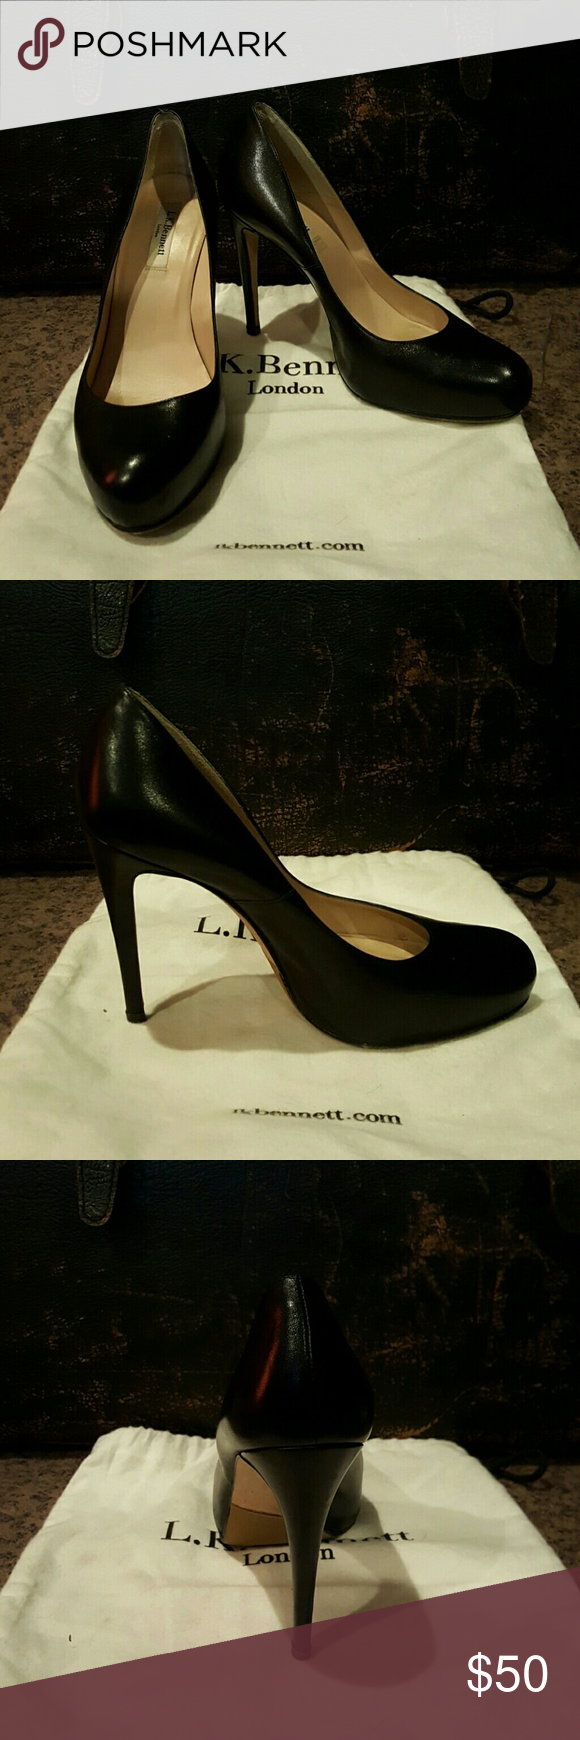 L.K. Bennett Stilletos Cute black Stilletos. Nice shape, textured sole. Includes dust bag, made in Spain. L.K. Bennett  Shoes Heels